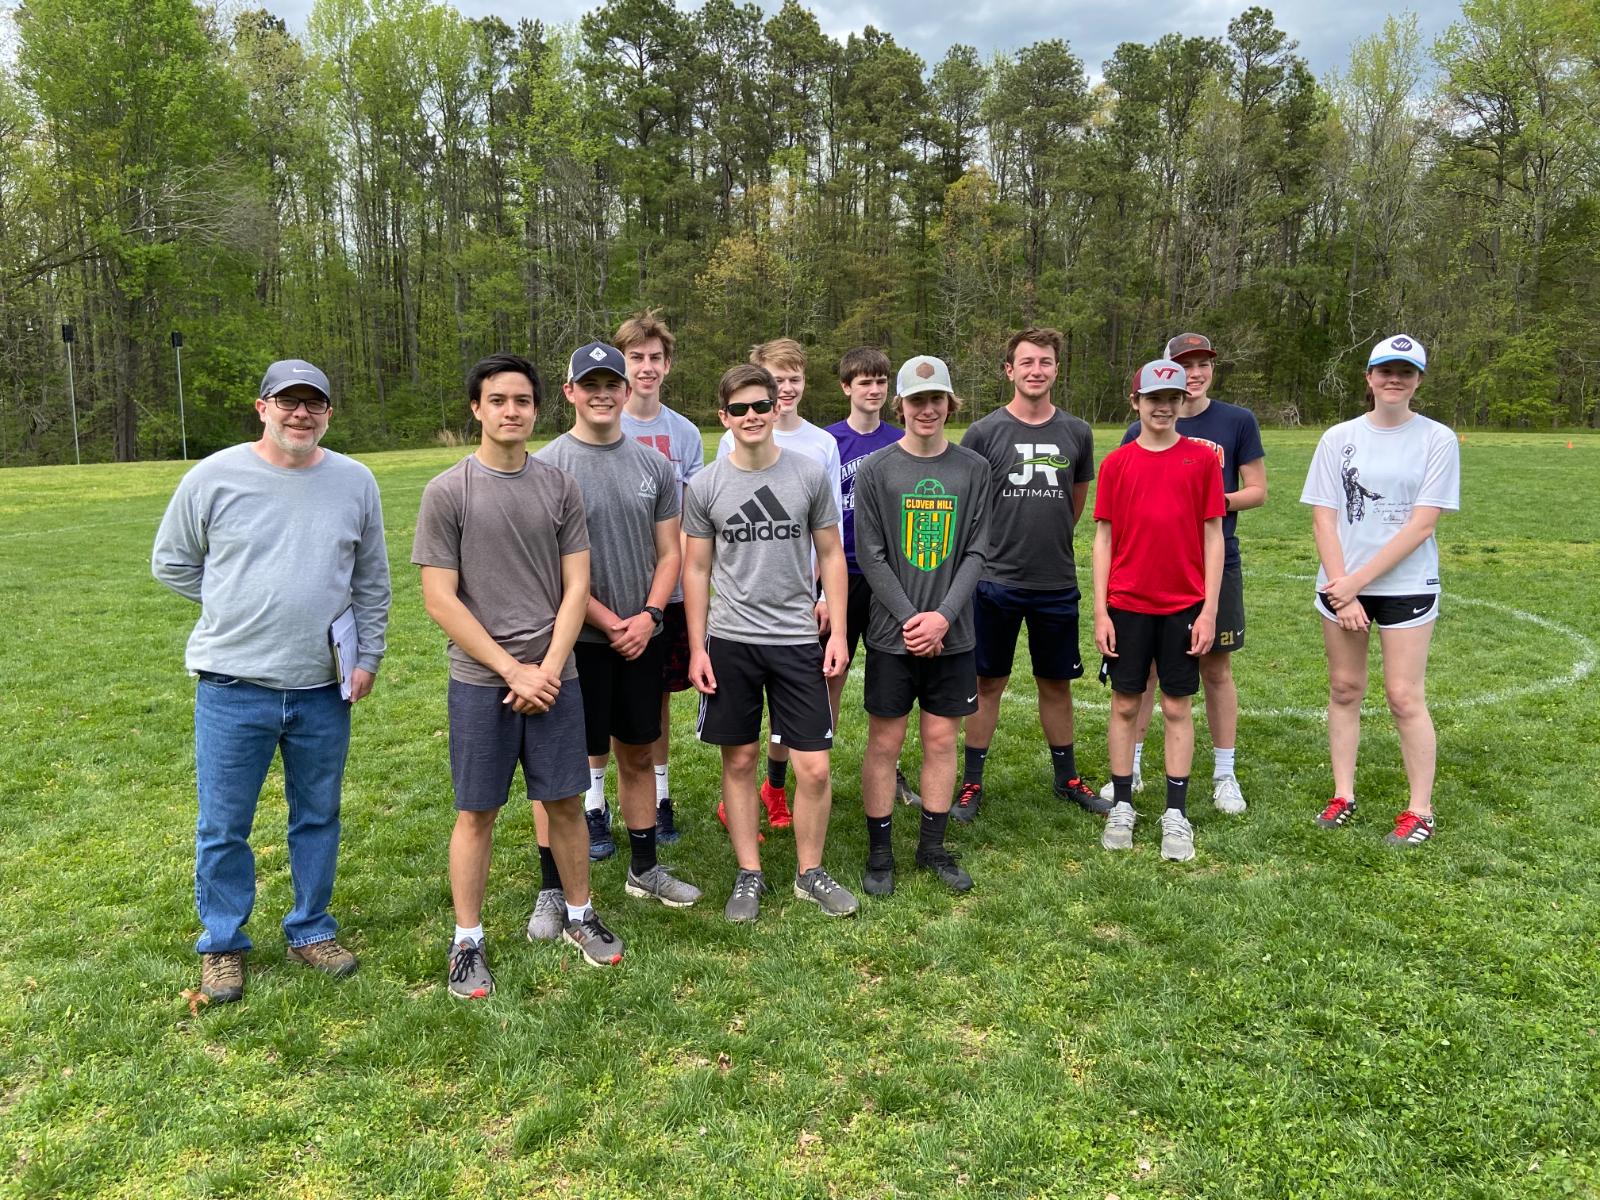 JR Ultimate Frisbee Team – Tournament runner-ups